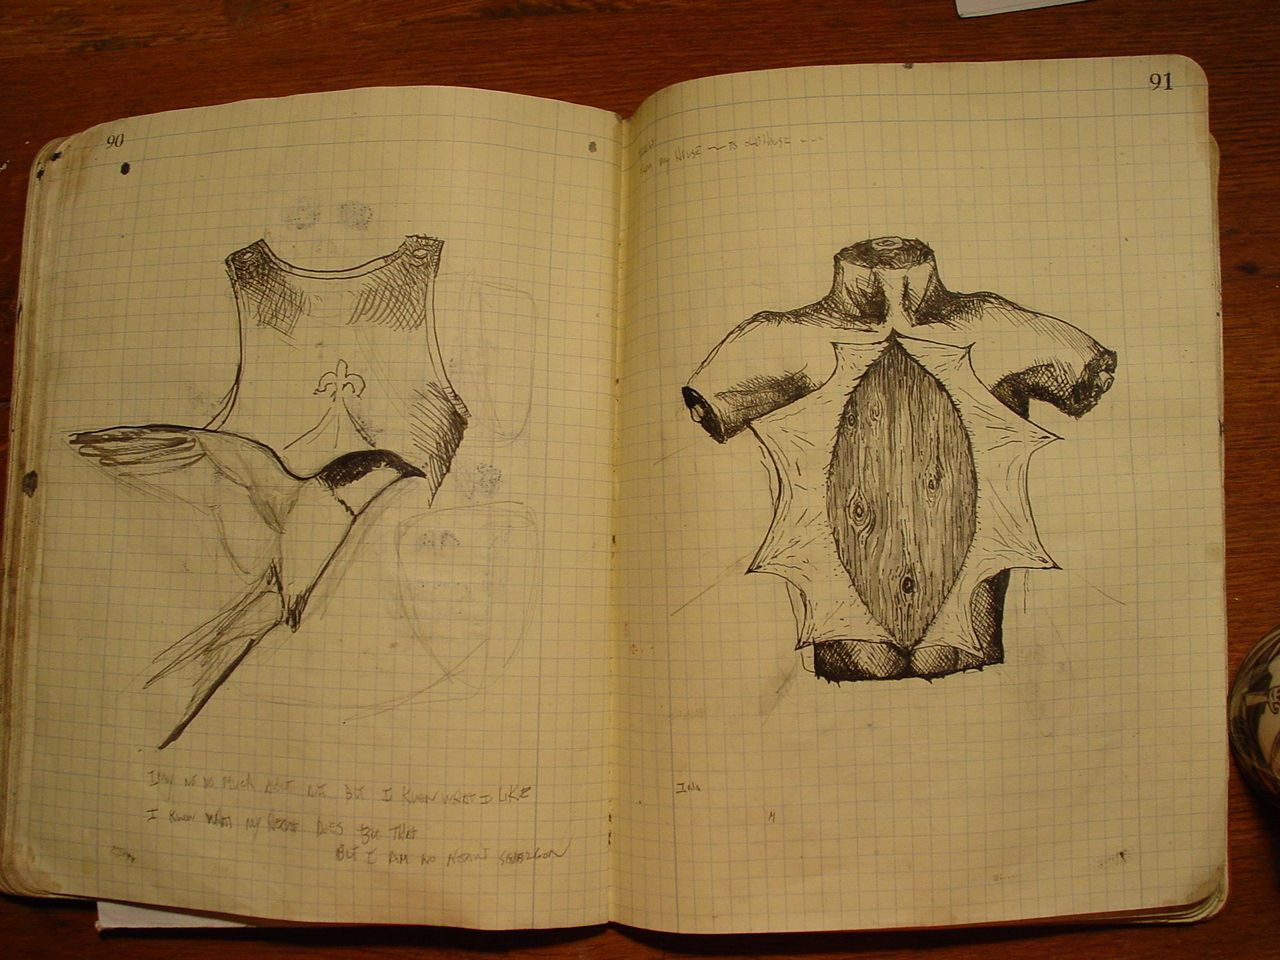 Genesis Chapman - Sketchbook (2004-2005)